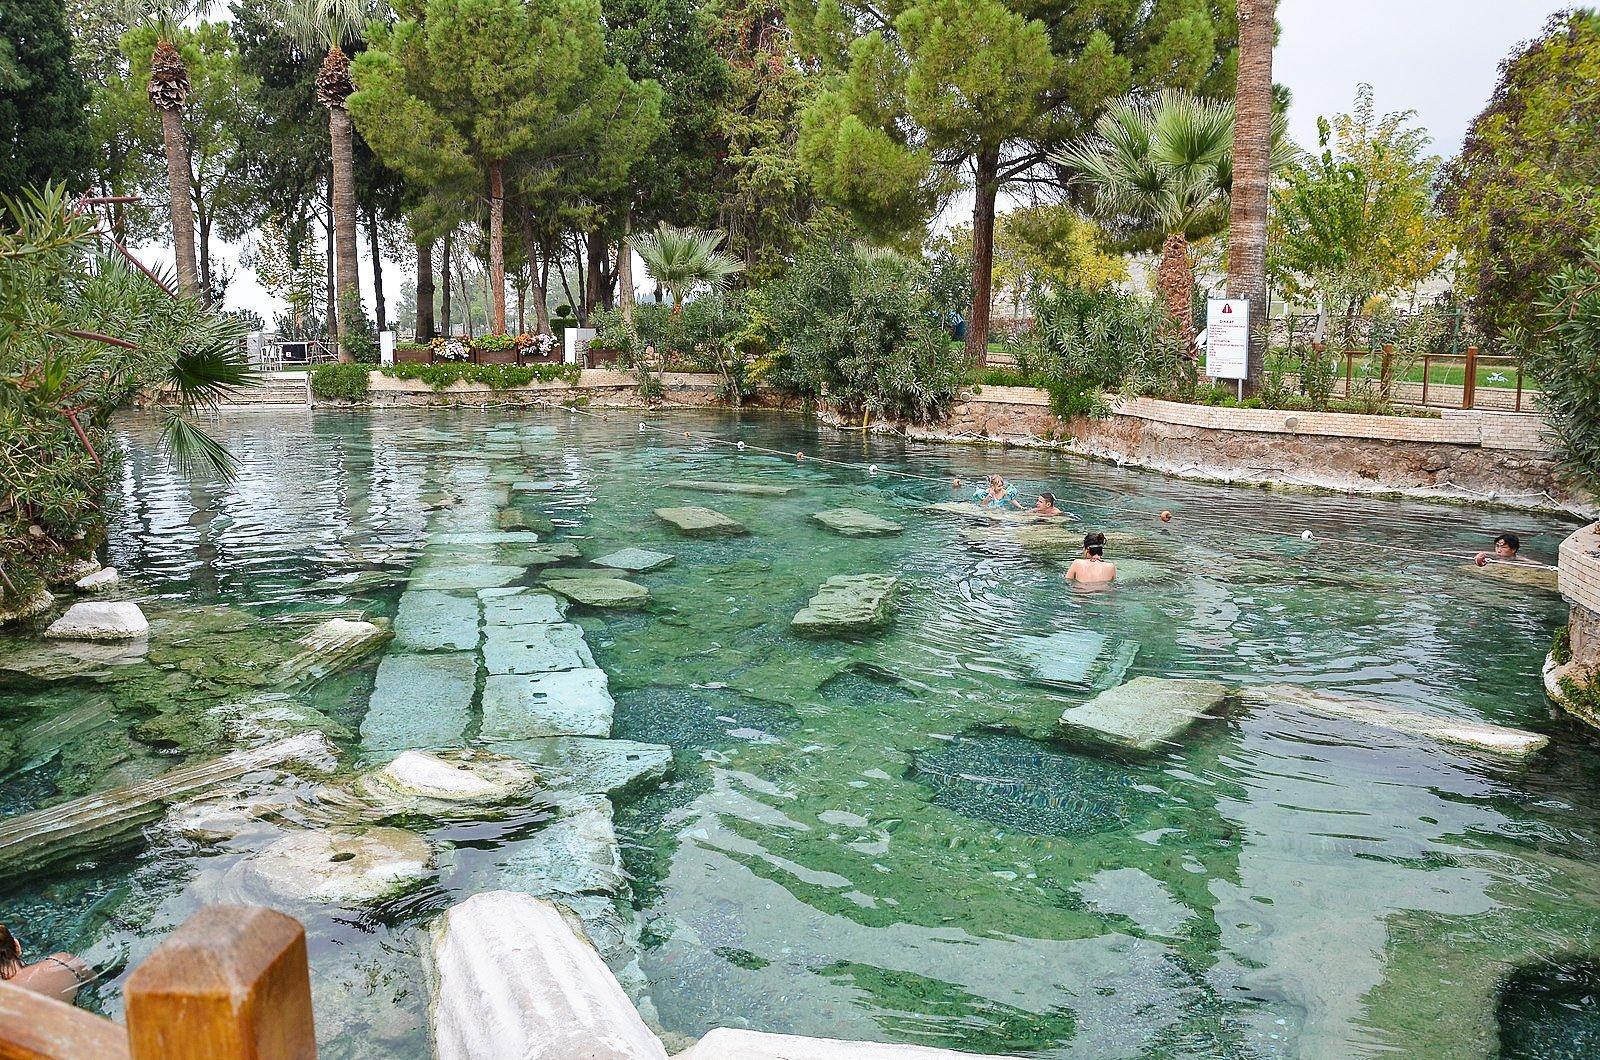 Antique Pool - Cleopatra's pool